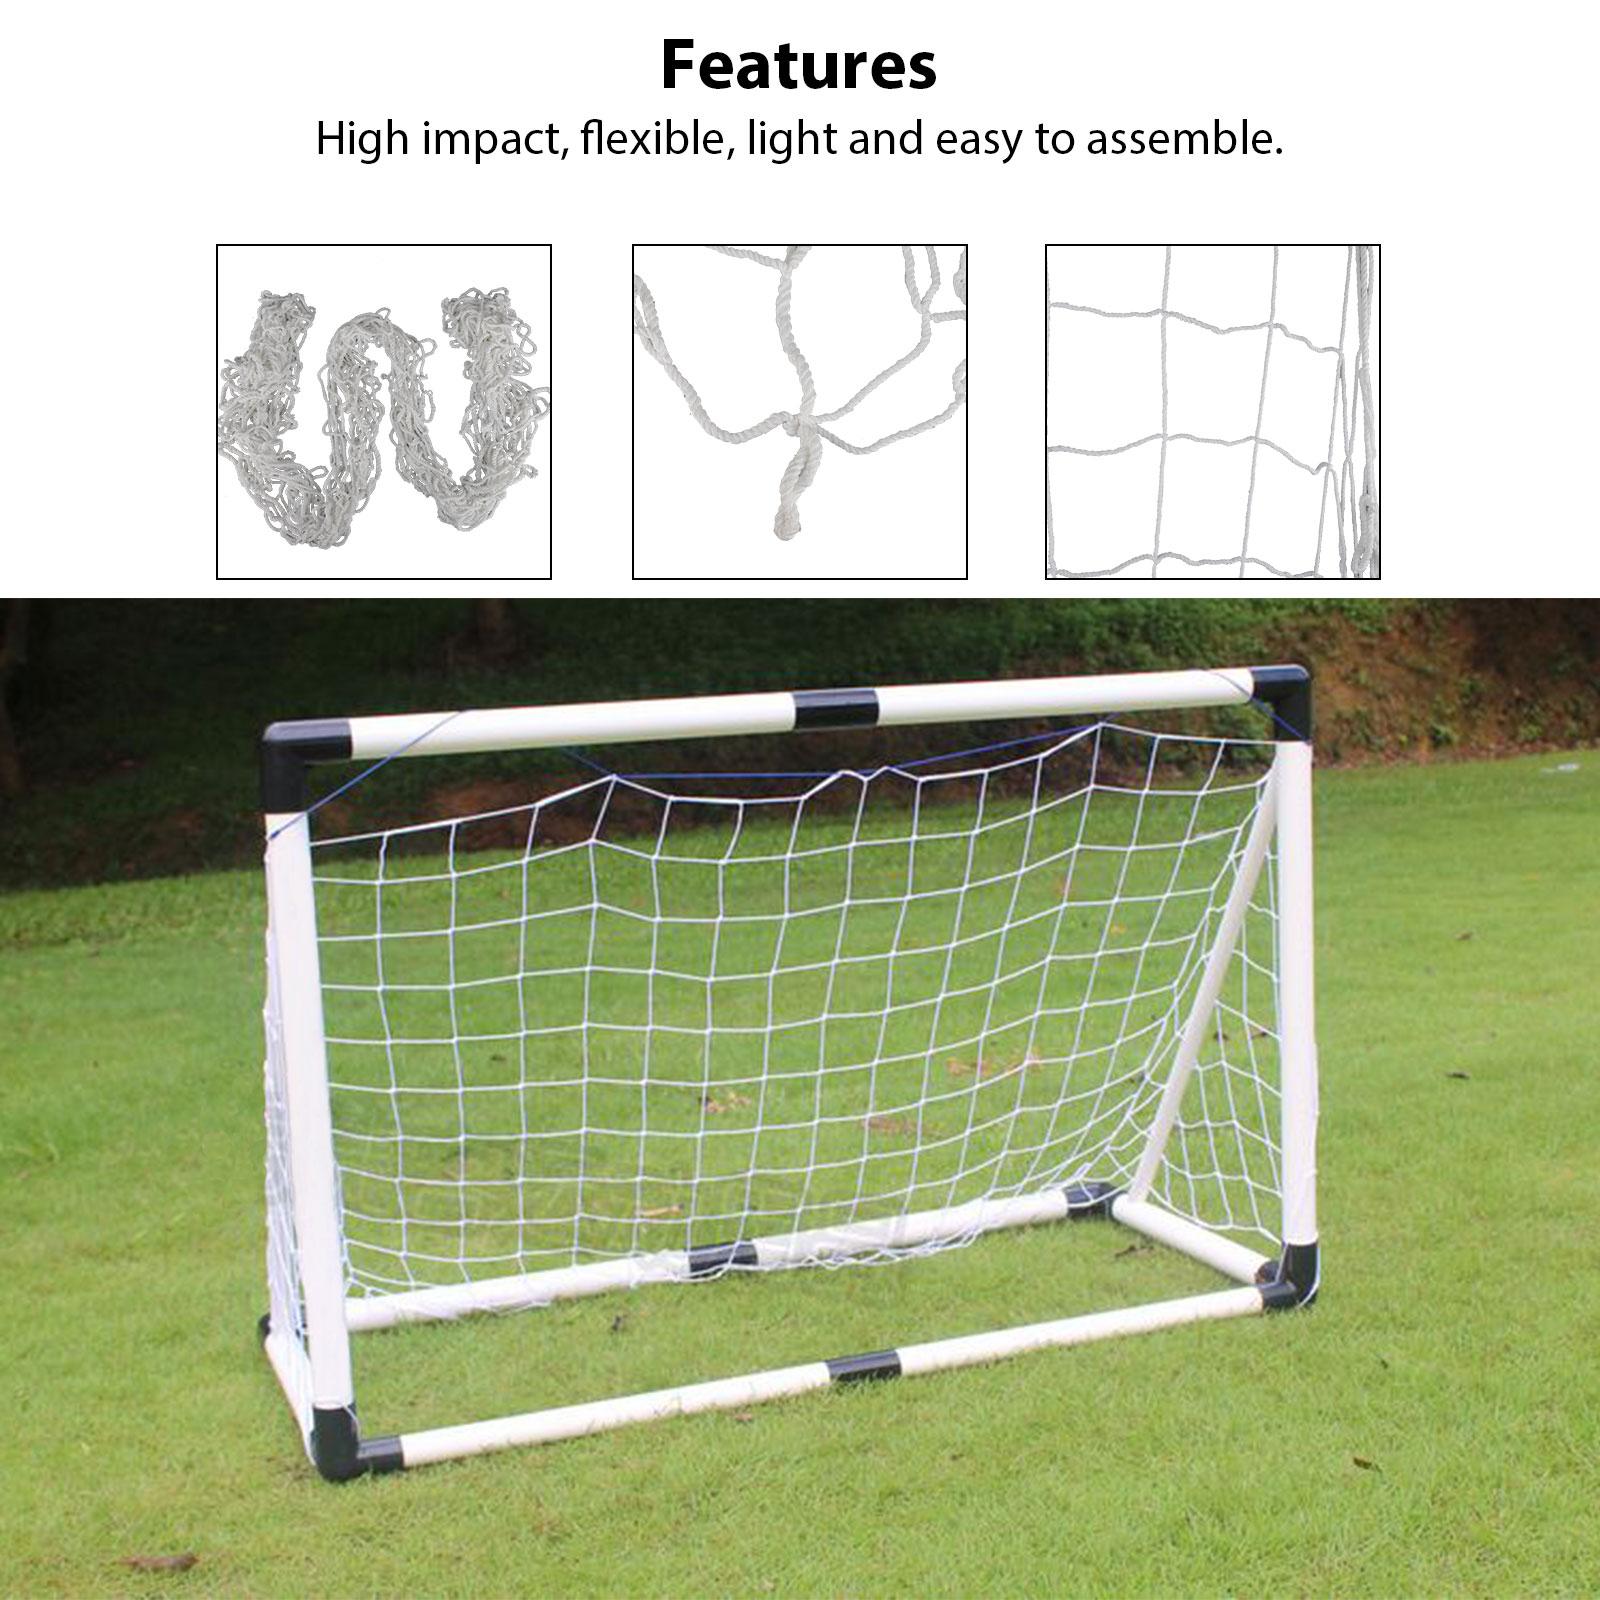 6-4ft-PE-Football-Soccer-Goal-Net-Outdoor-Backyard-Sport-Match-Training-for-Kids thumbnail 3